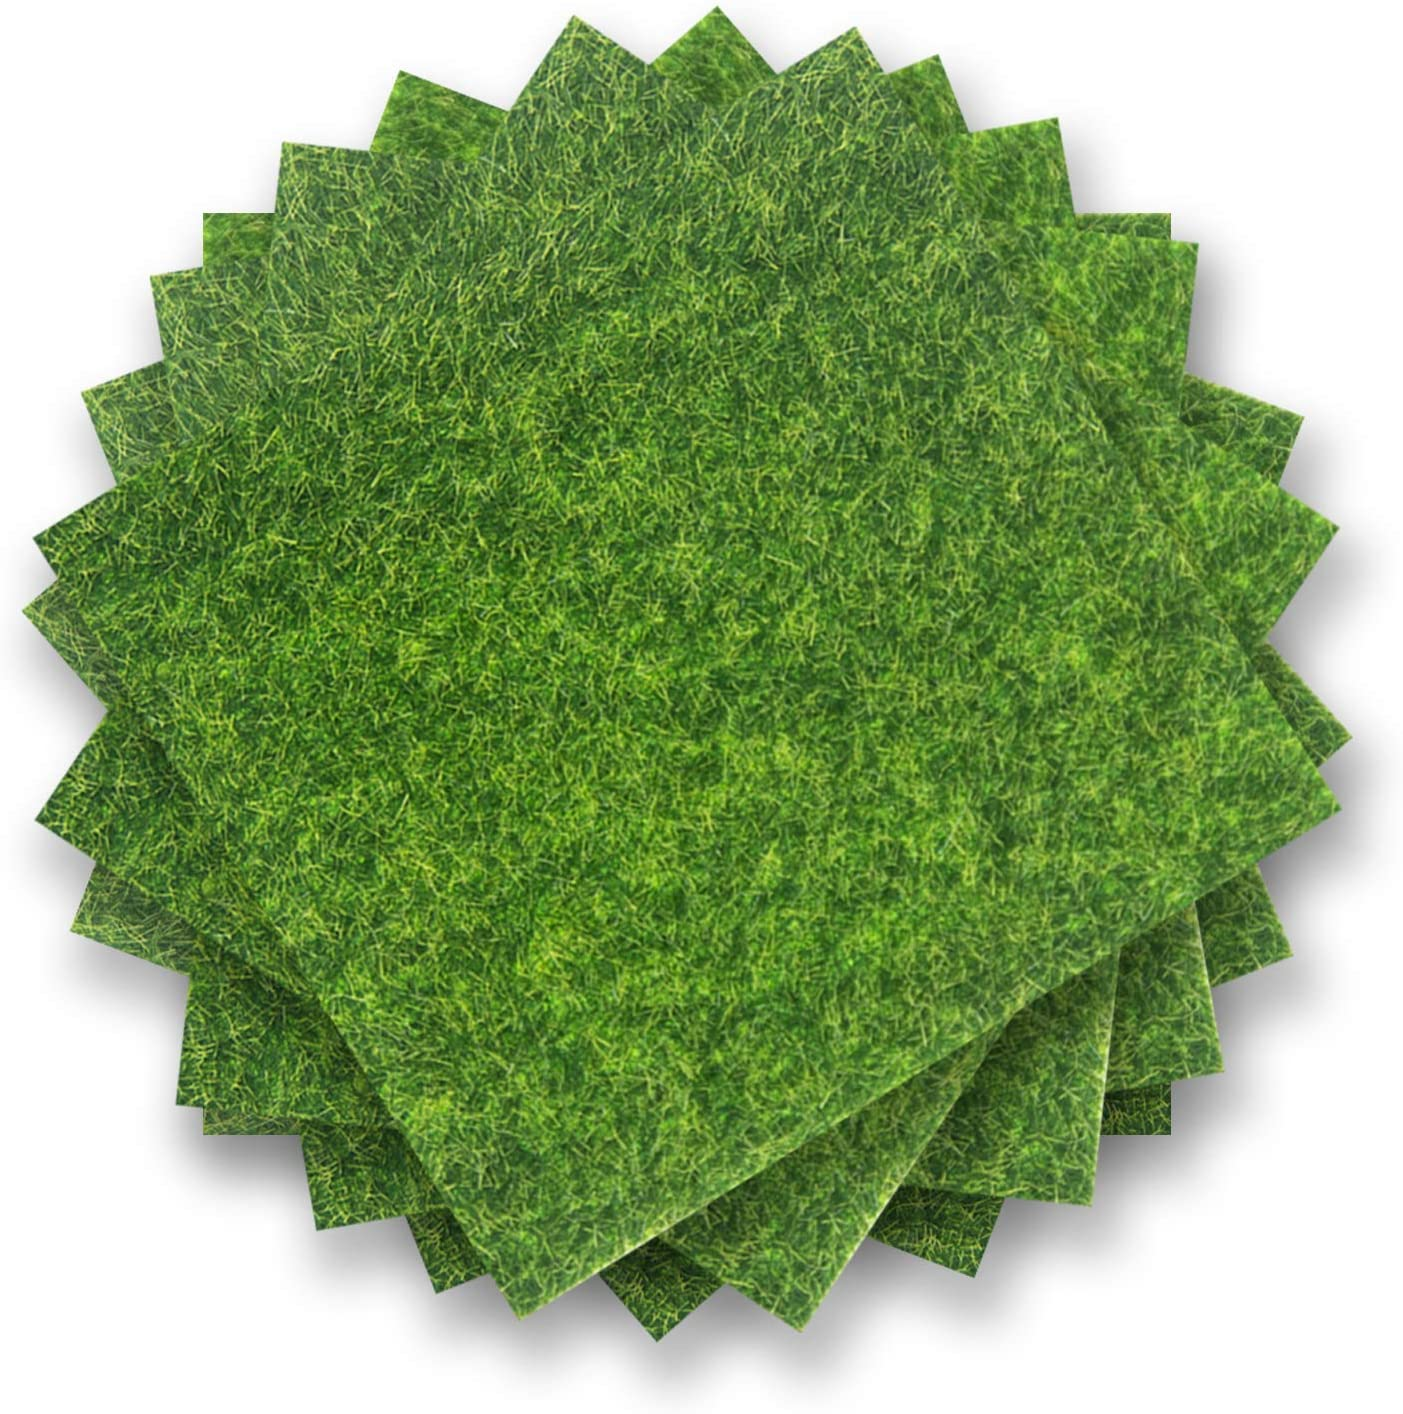 ODDIER 8pcs Artificial Garden Grass, Life-Like Fairy Artificial Grass,Fake Lawn for Miniature Decoration Ornament Garden Dollhouse DIY Grass 6 x 6 Inches